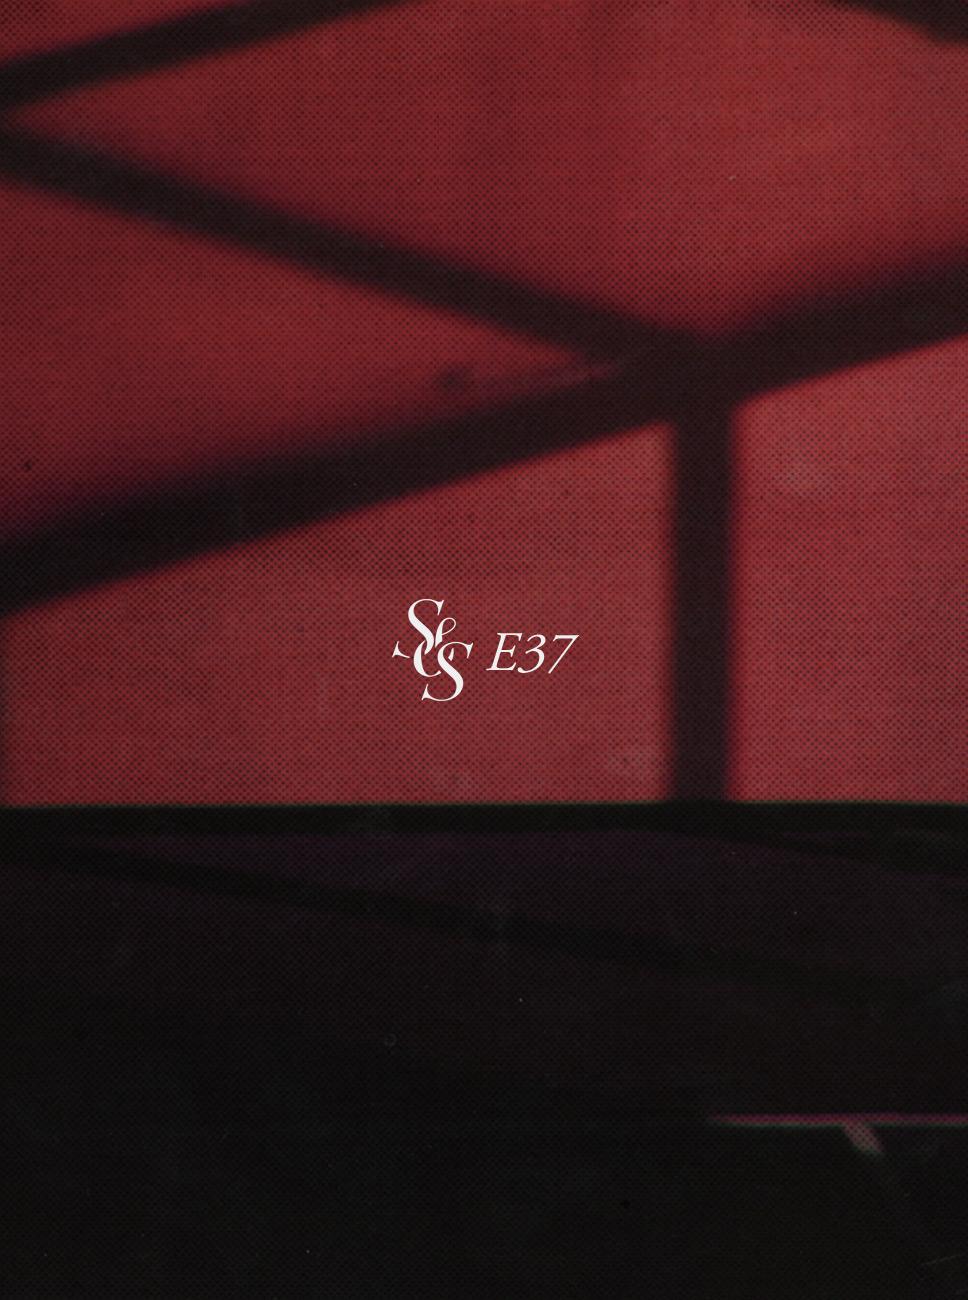 S&S-NewtownRadio-E37